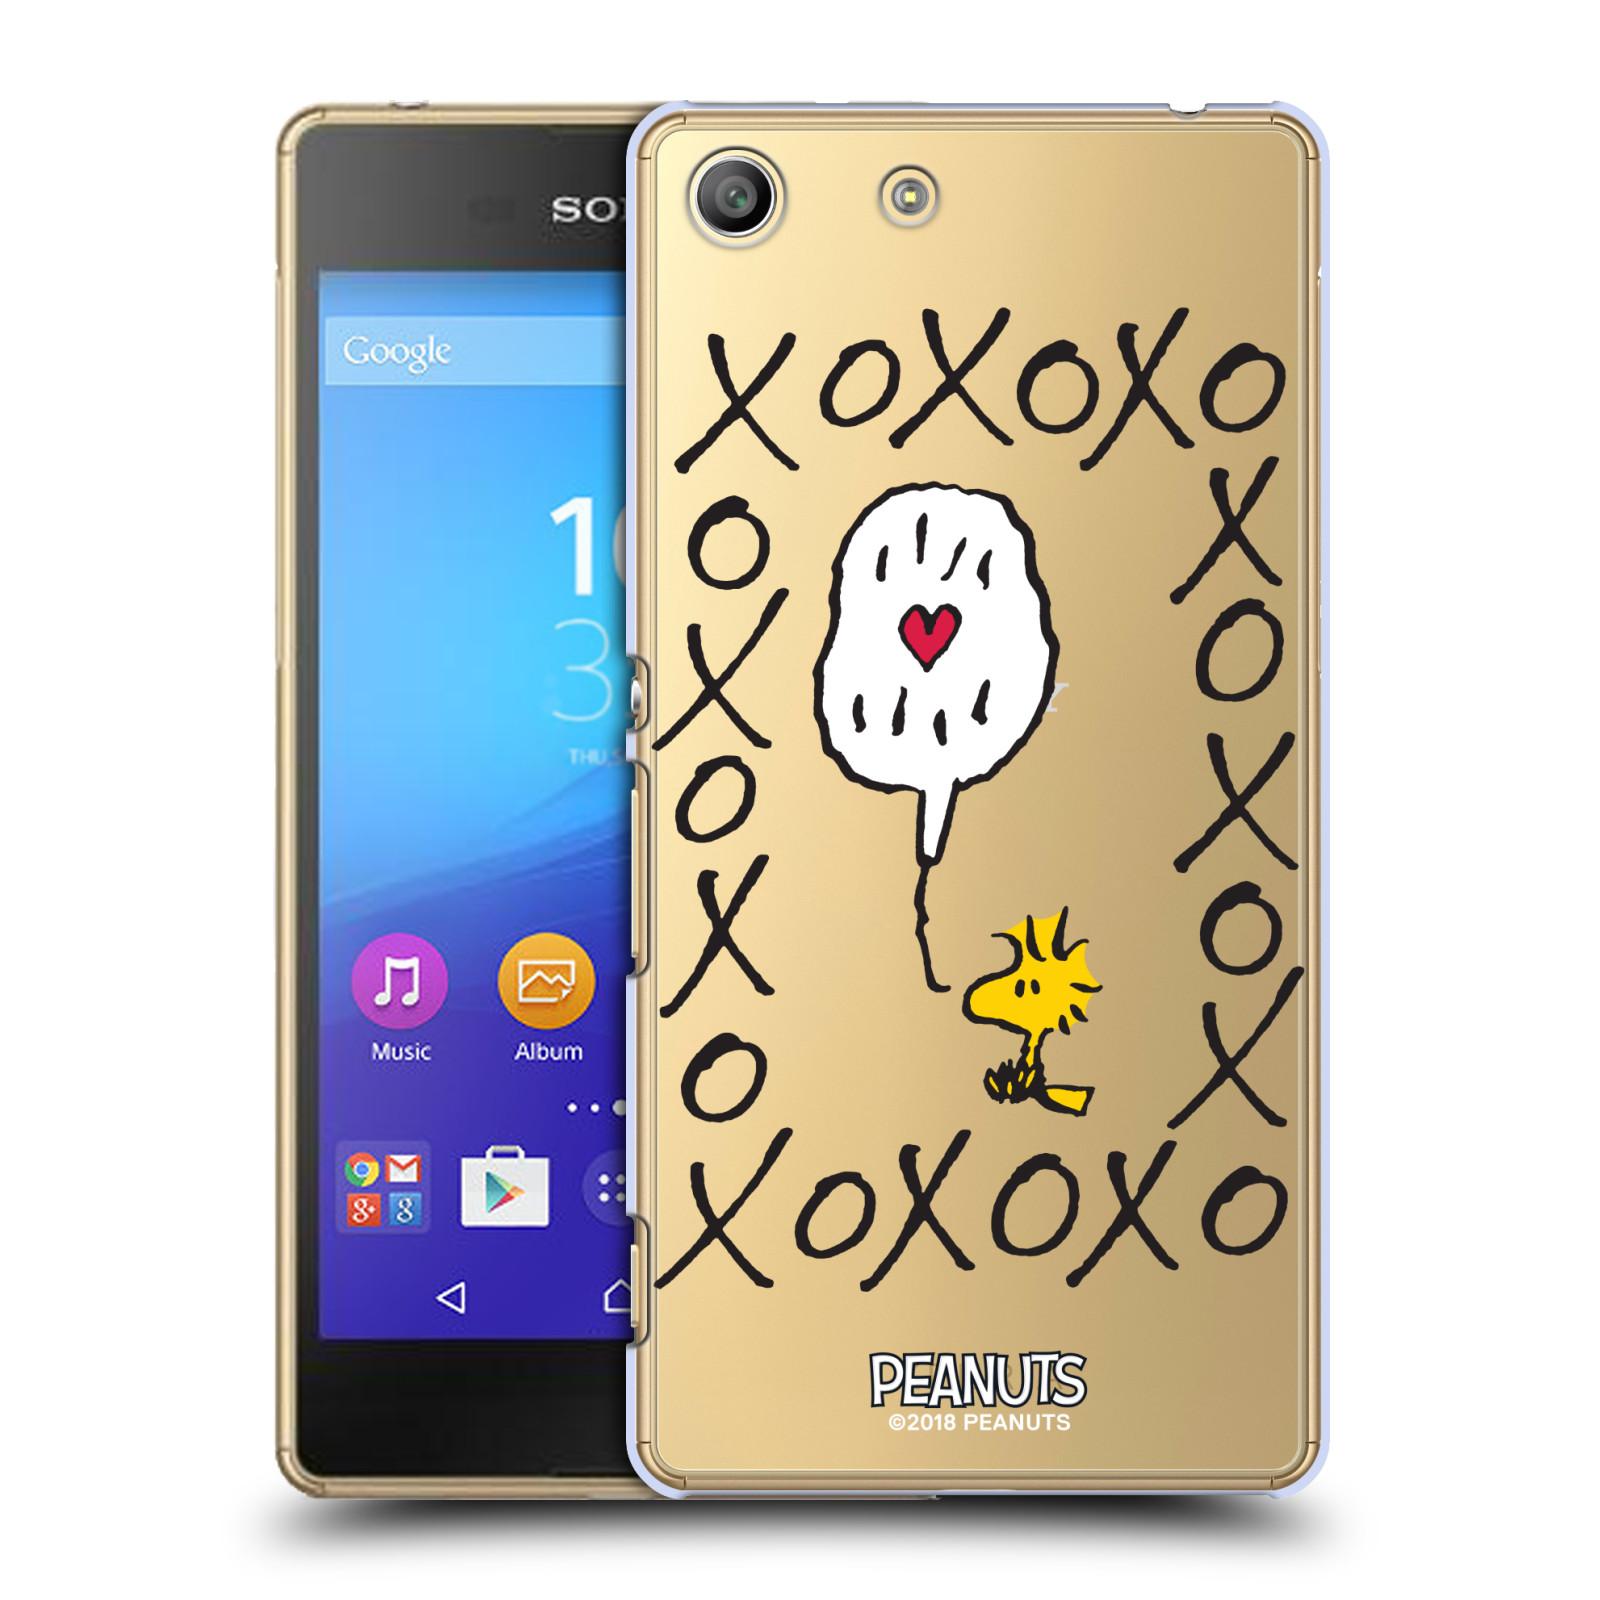 Pouzdro na mobil Sony Xperia M5 Oficiální motiv Peanuts ptáček Woodstock srdíčko